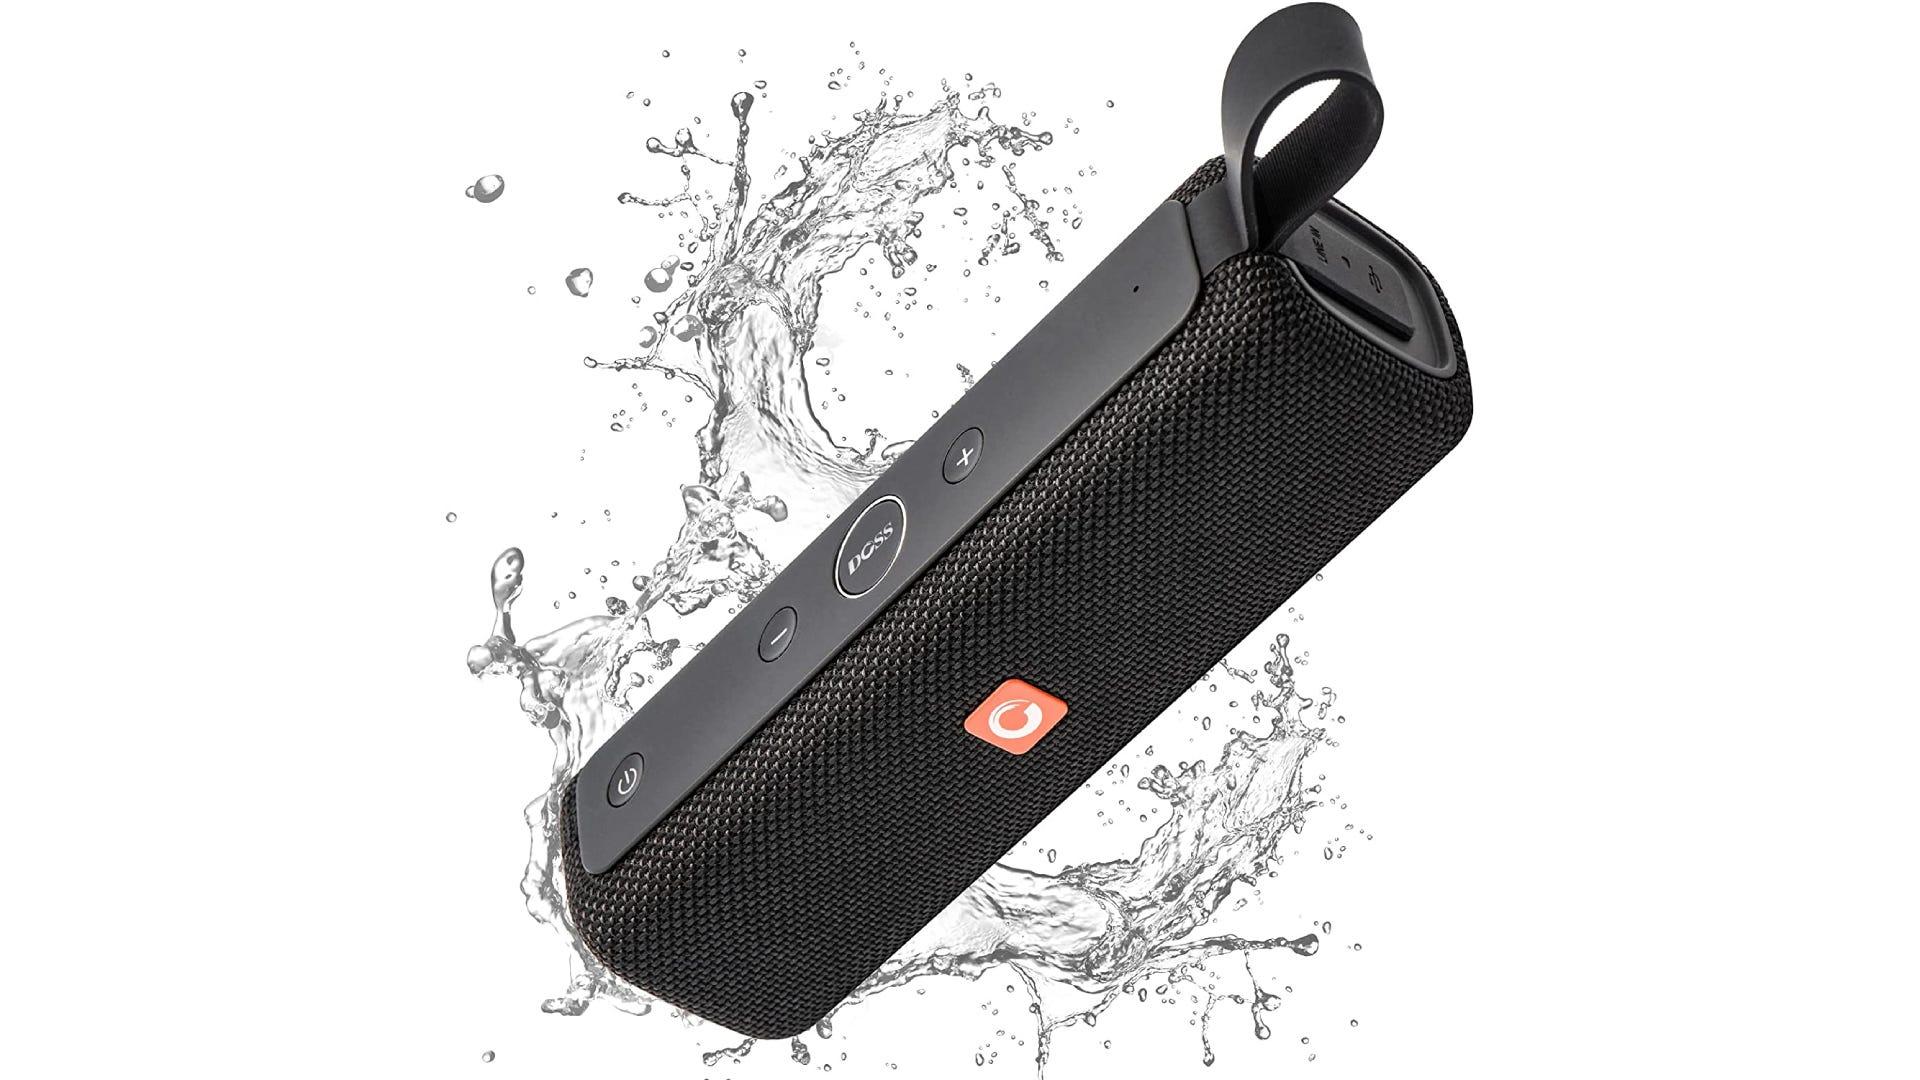 A rectangular black speaker with a finger strap splashes through water.